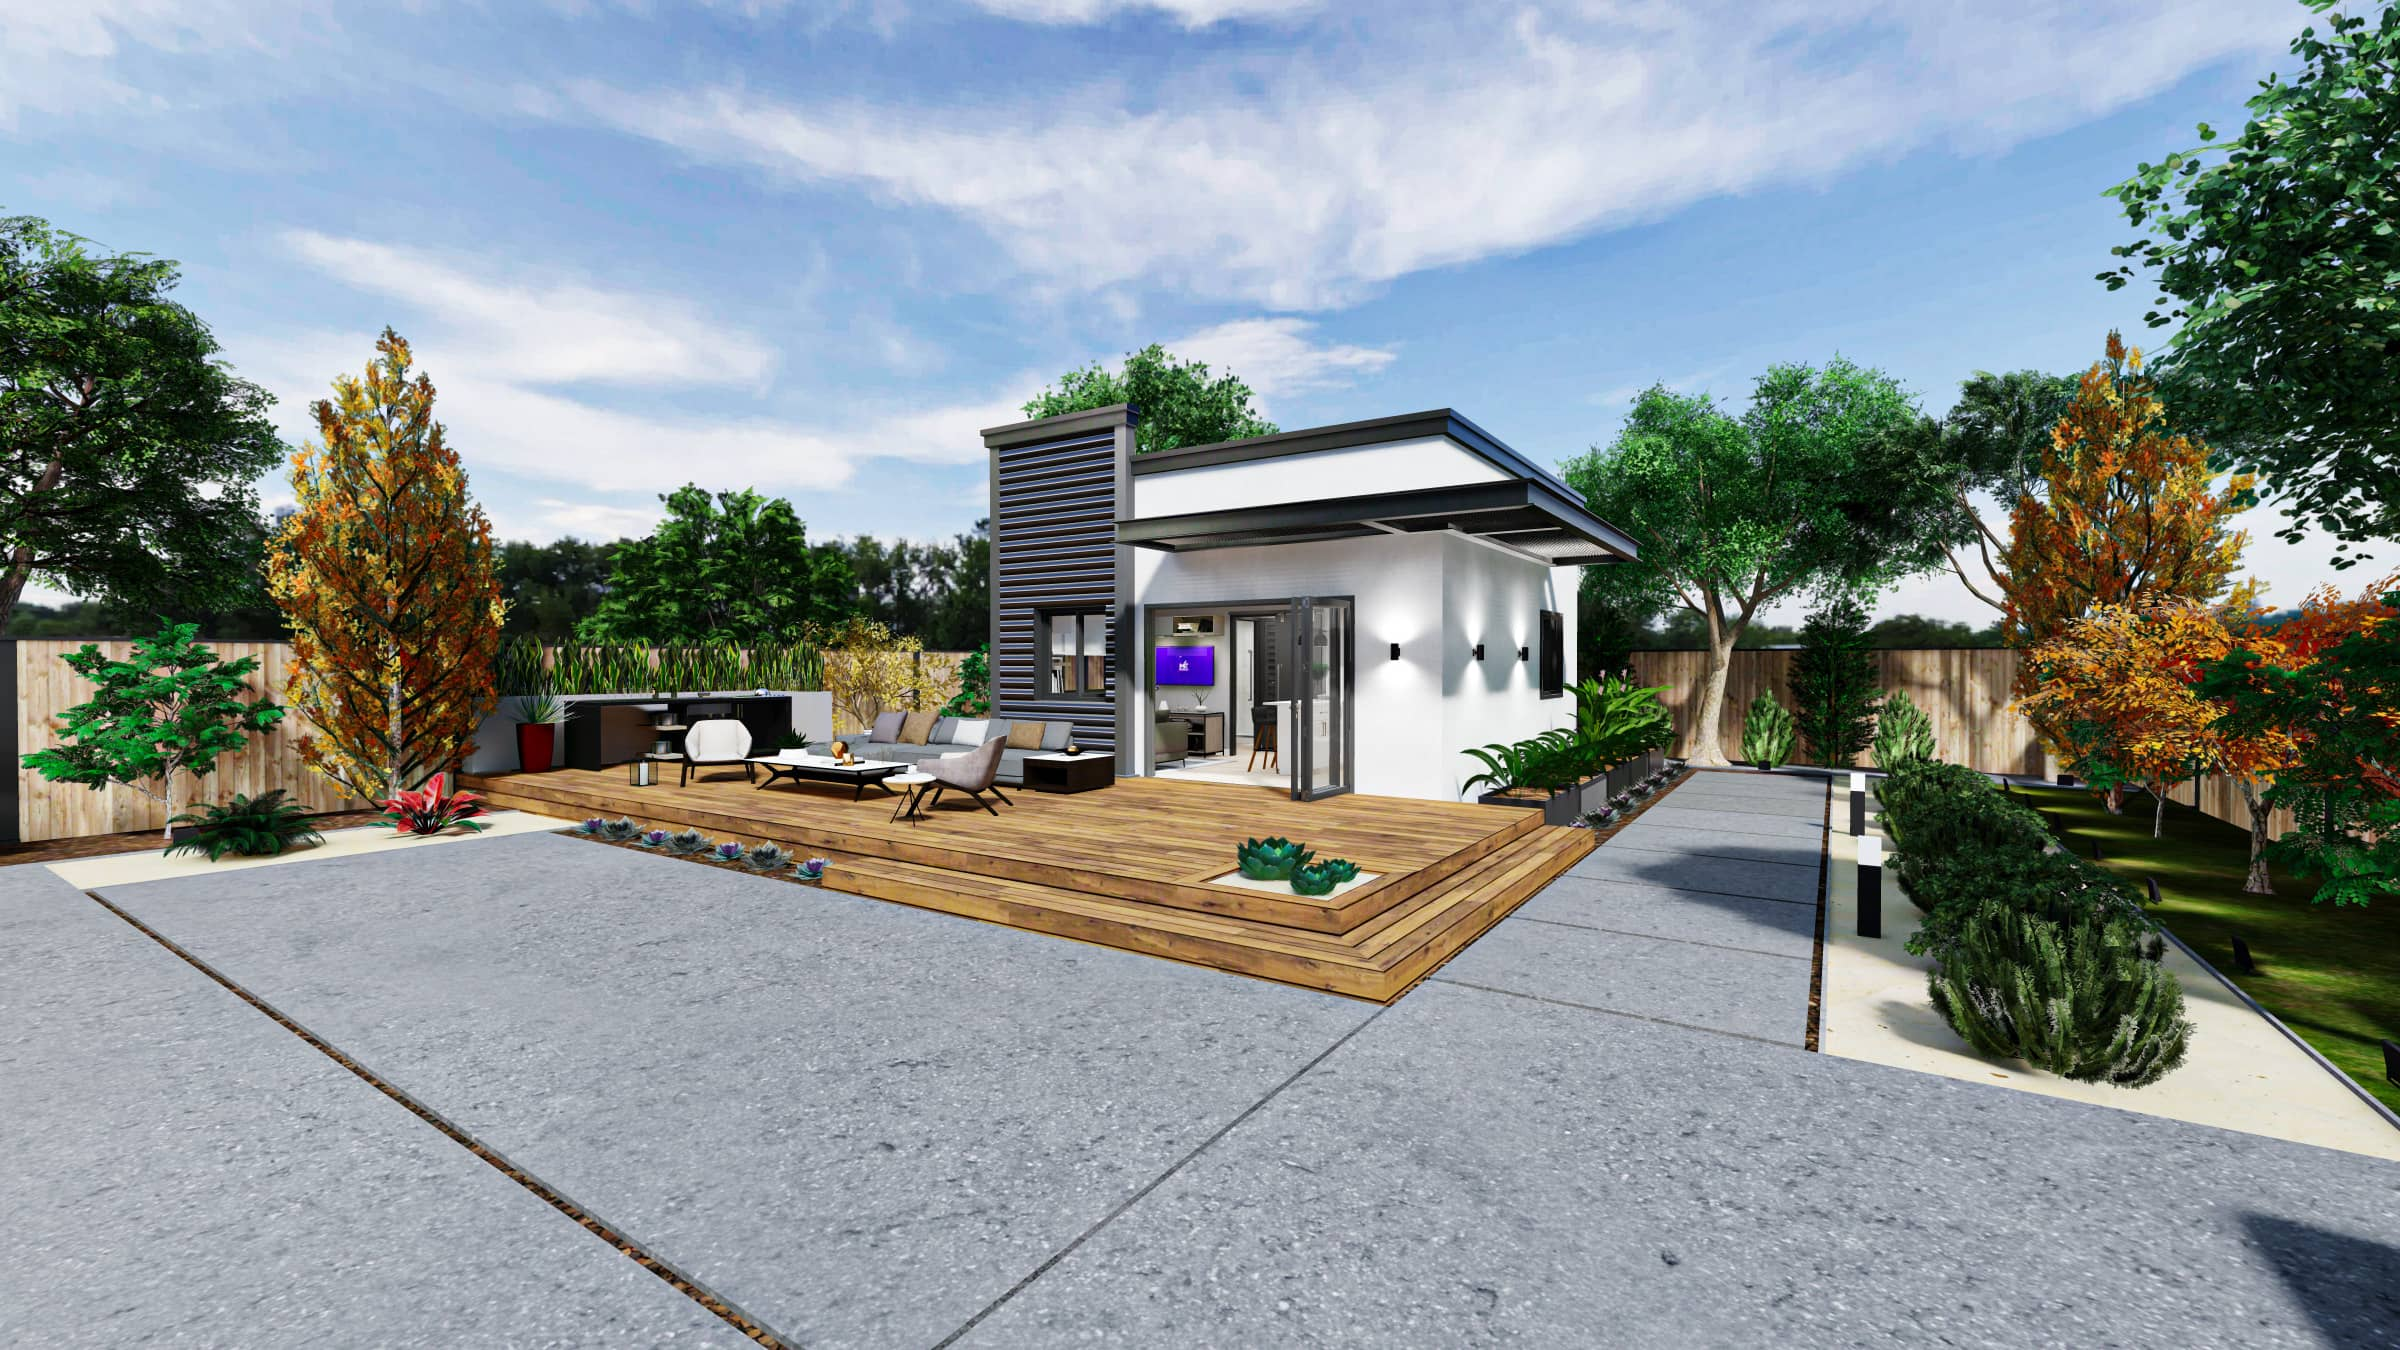 Detached Premium ADU 400 square feet for ADU Catalog by Multitaskr in San Diego County